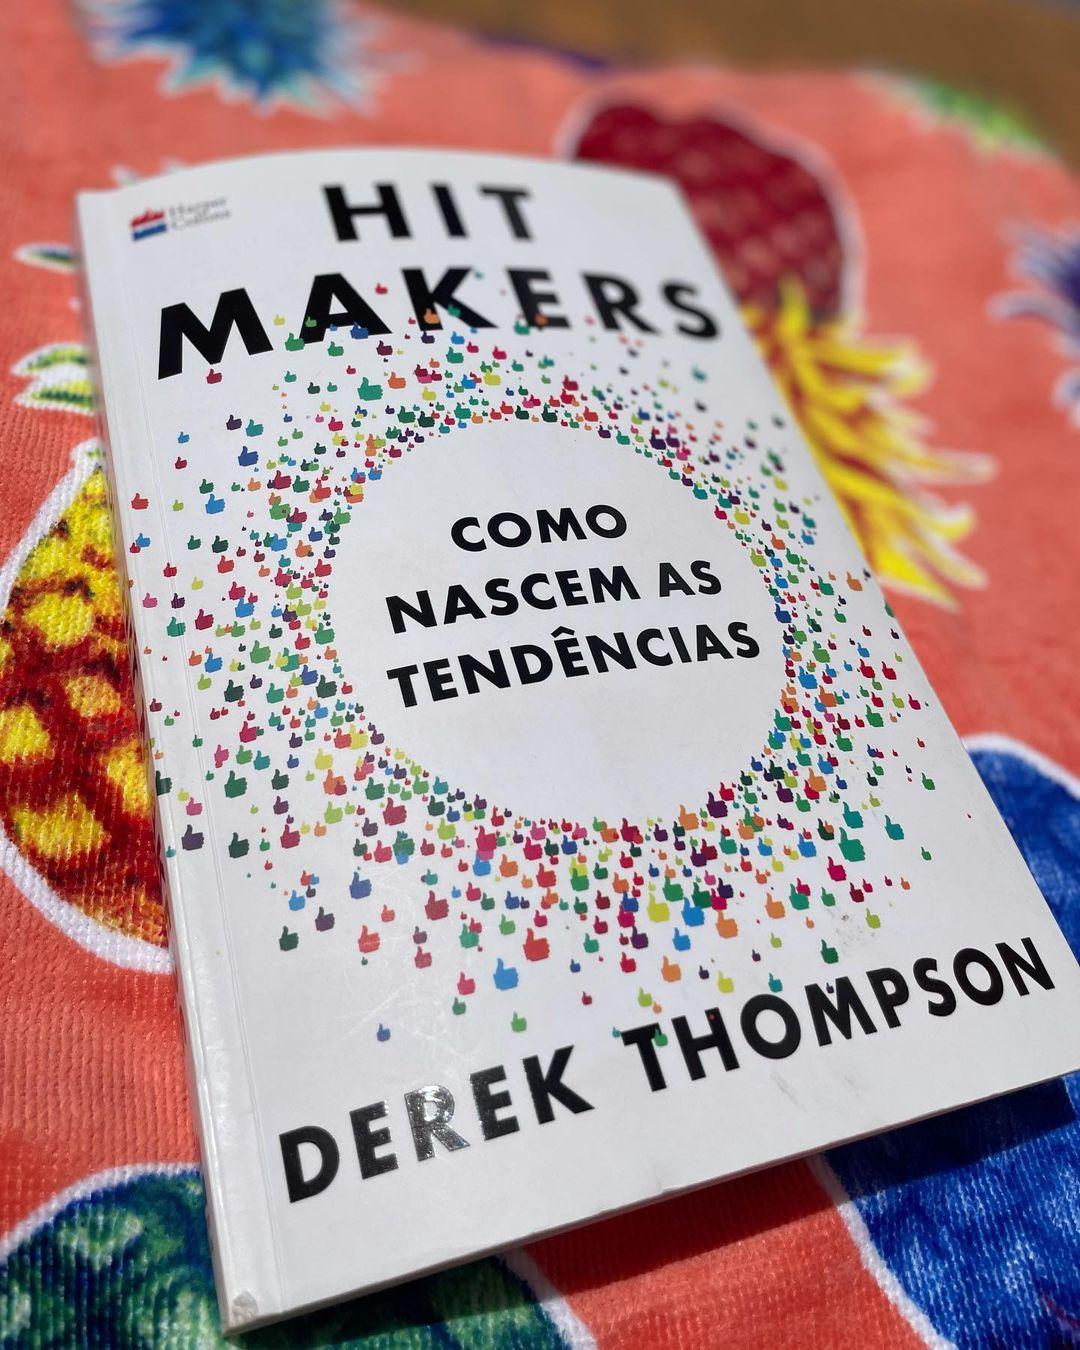 hit-makers-como-nascem-as-tendencias-iara-leao-consultoria-1